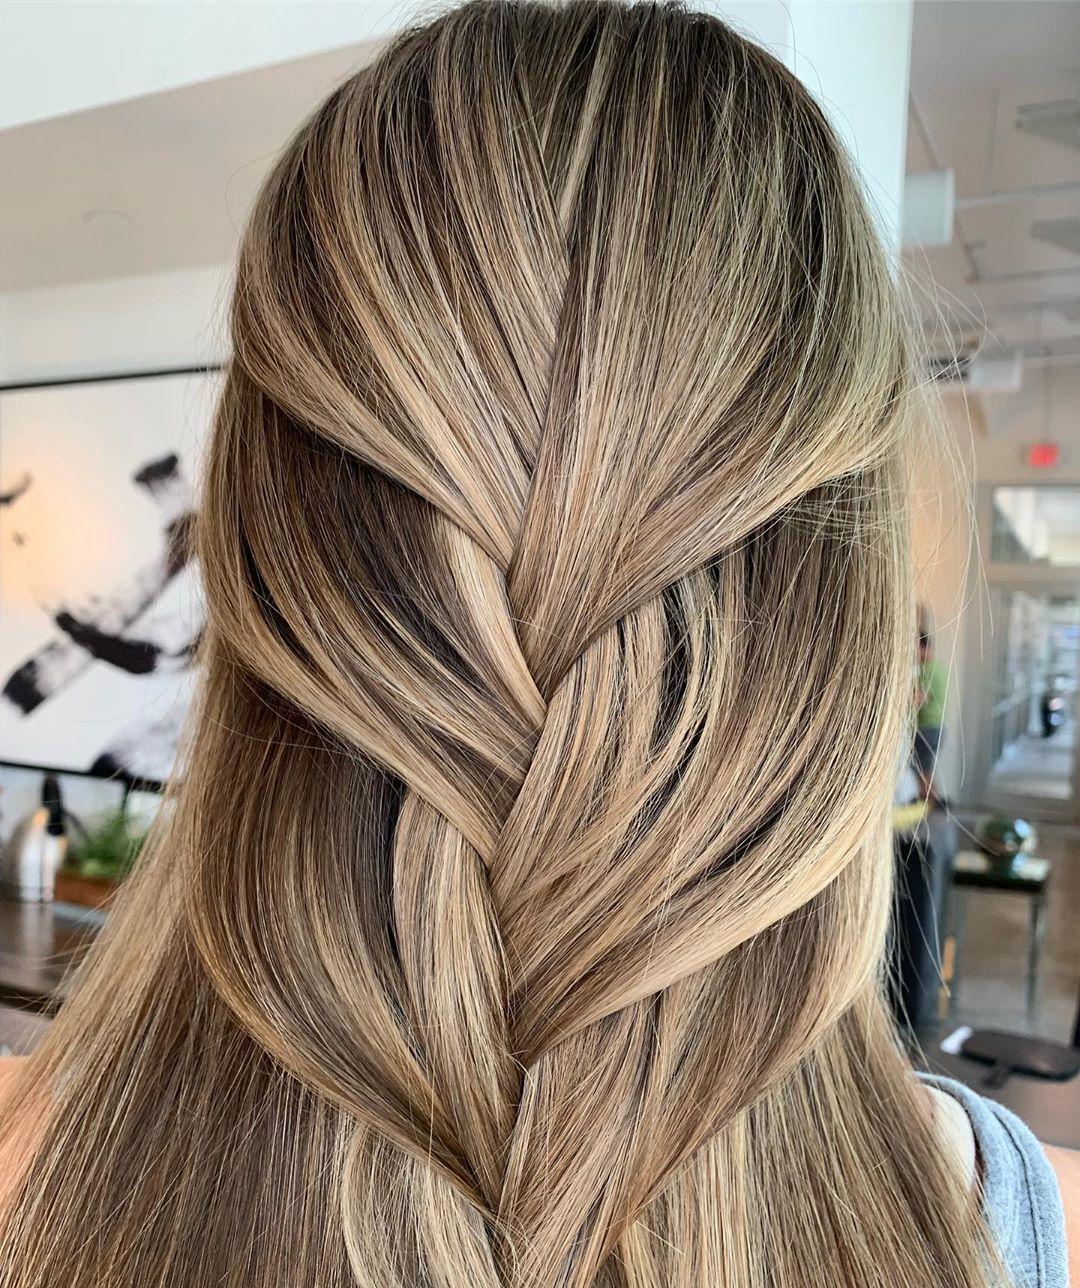 Simple ponytail in Boho Braid style